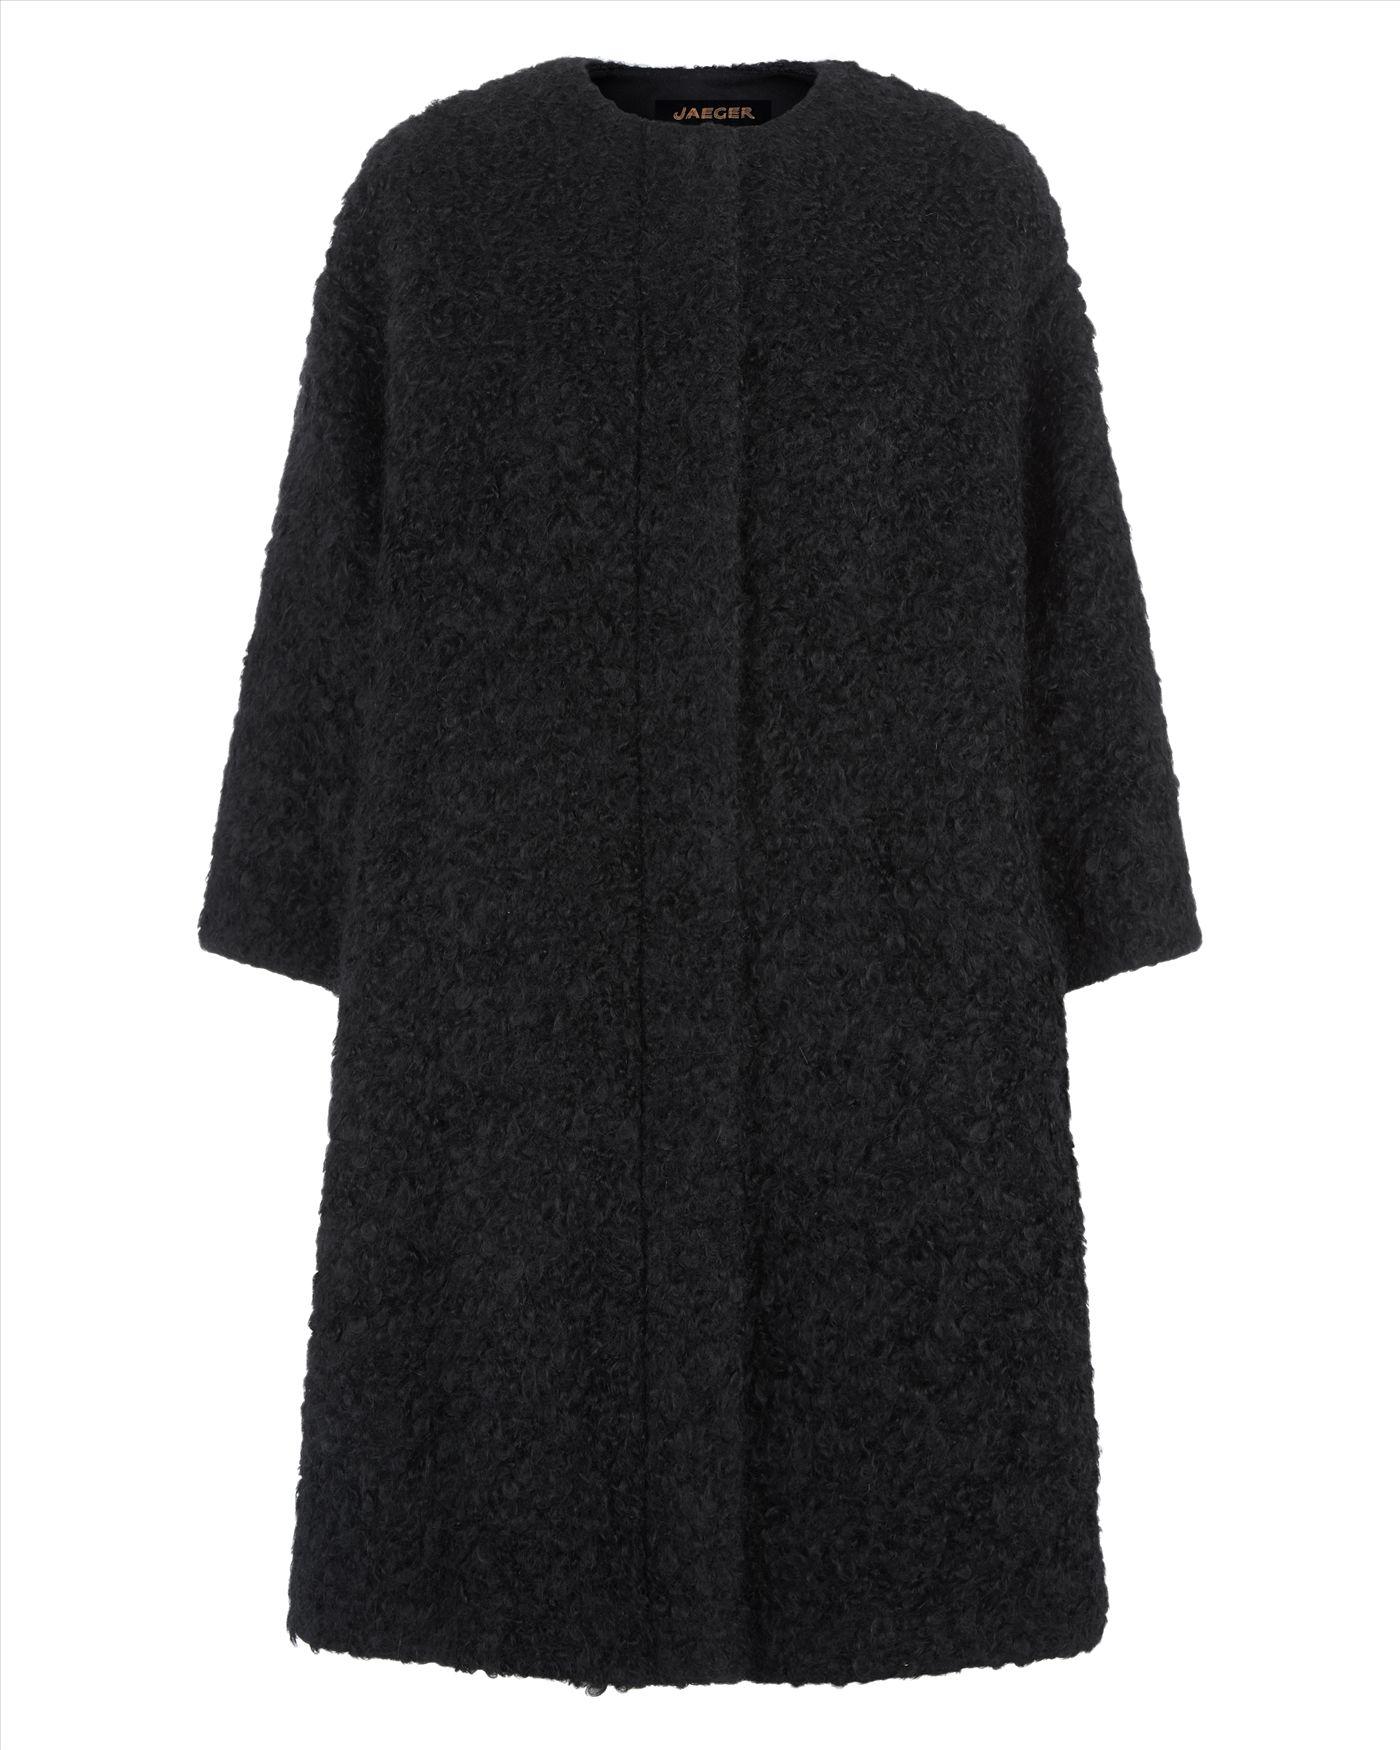 Jaeger Wool Mohair Cocoon Coat in Black